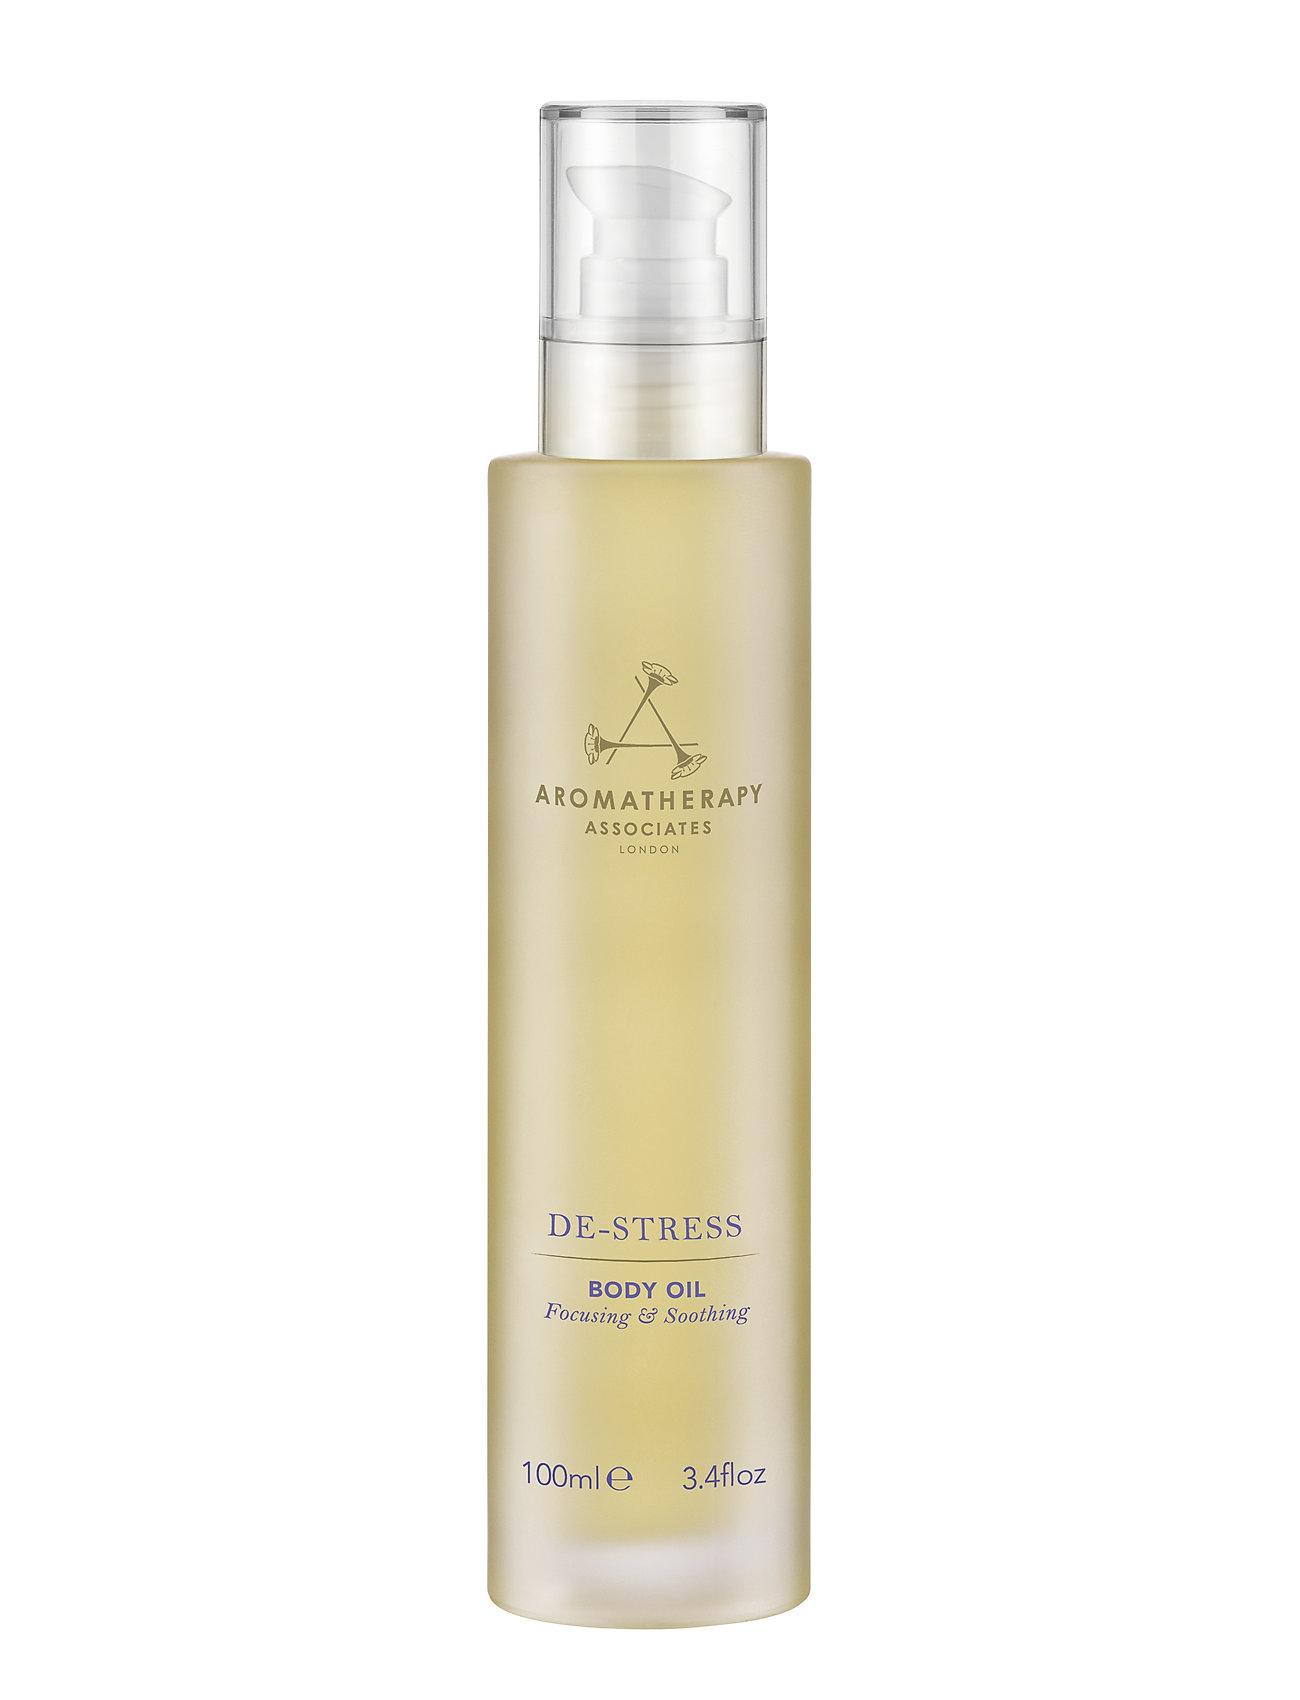 Aromatherapy Associates DE-STRESS BODY OIL - CLEAR